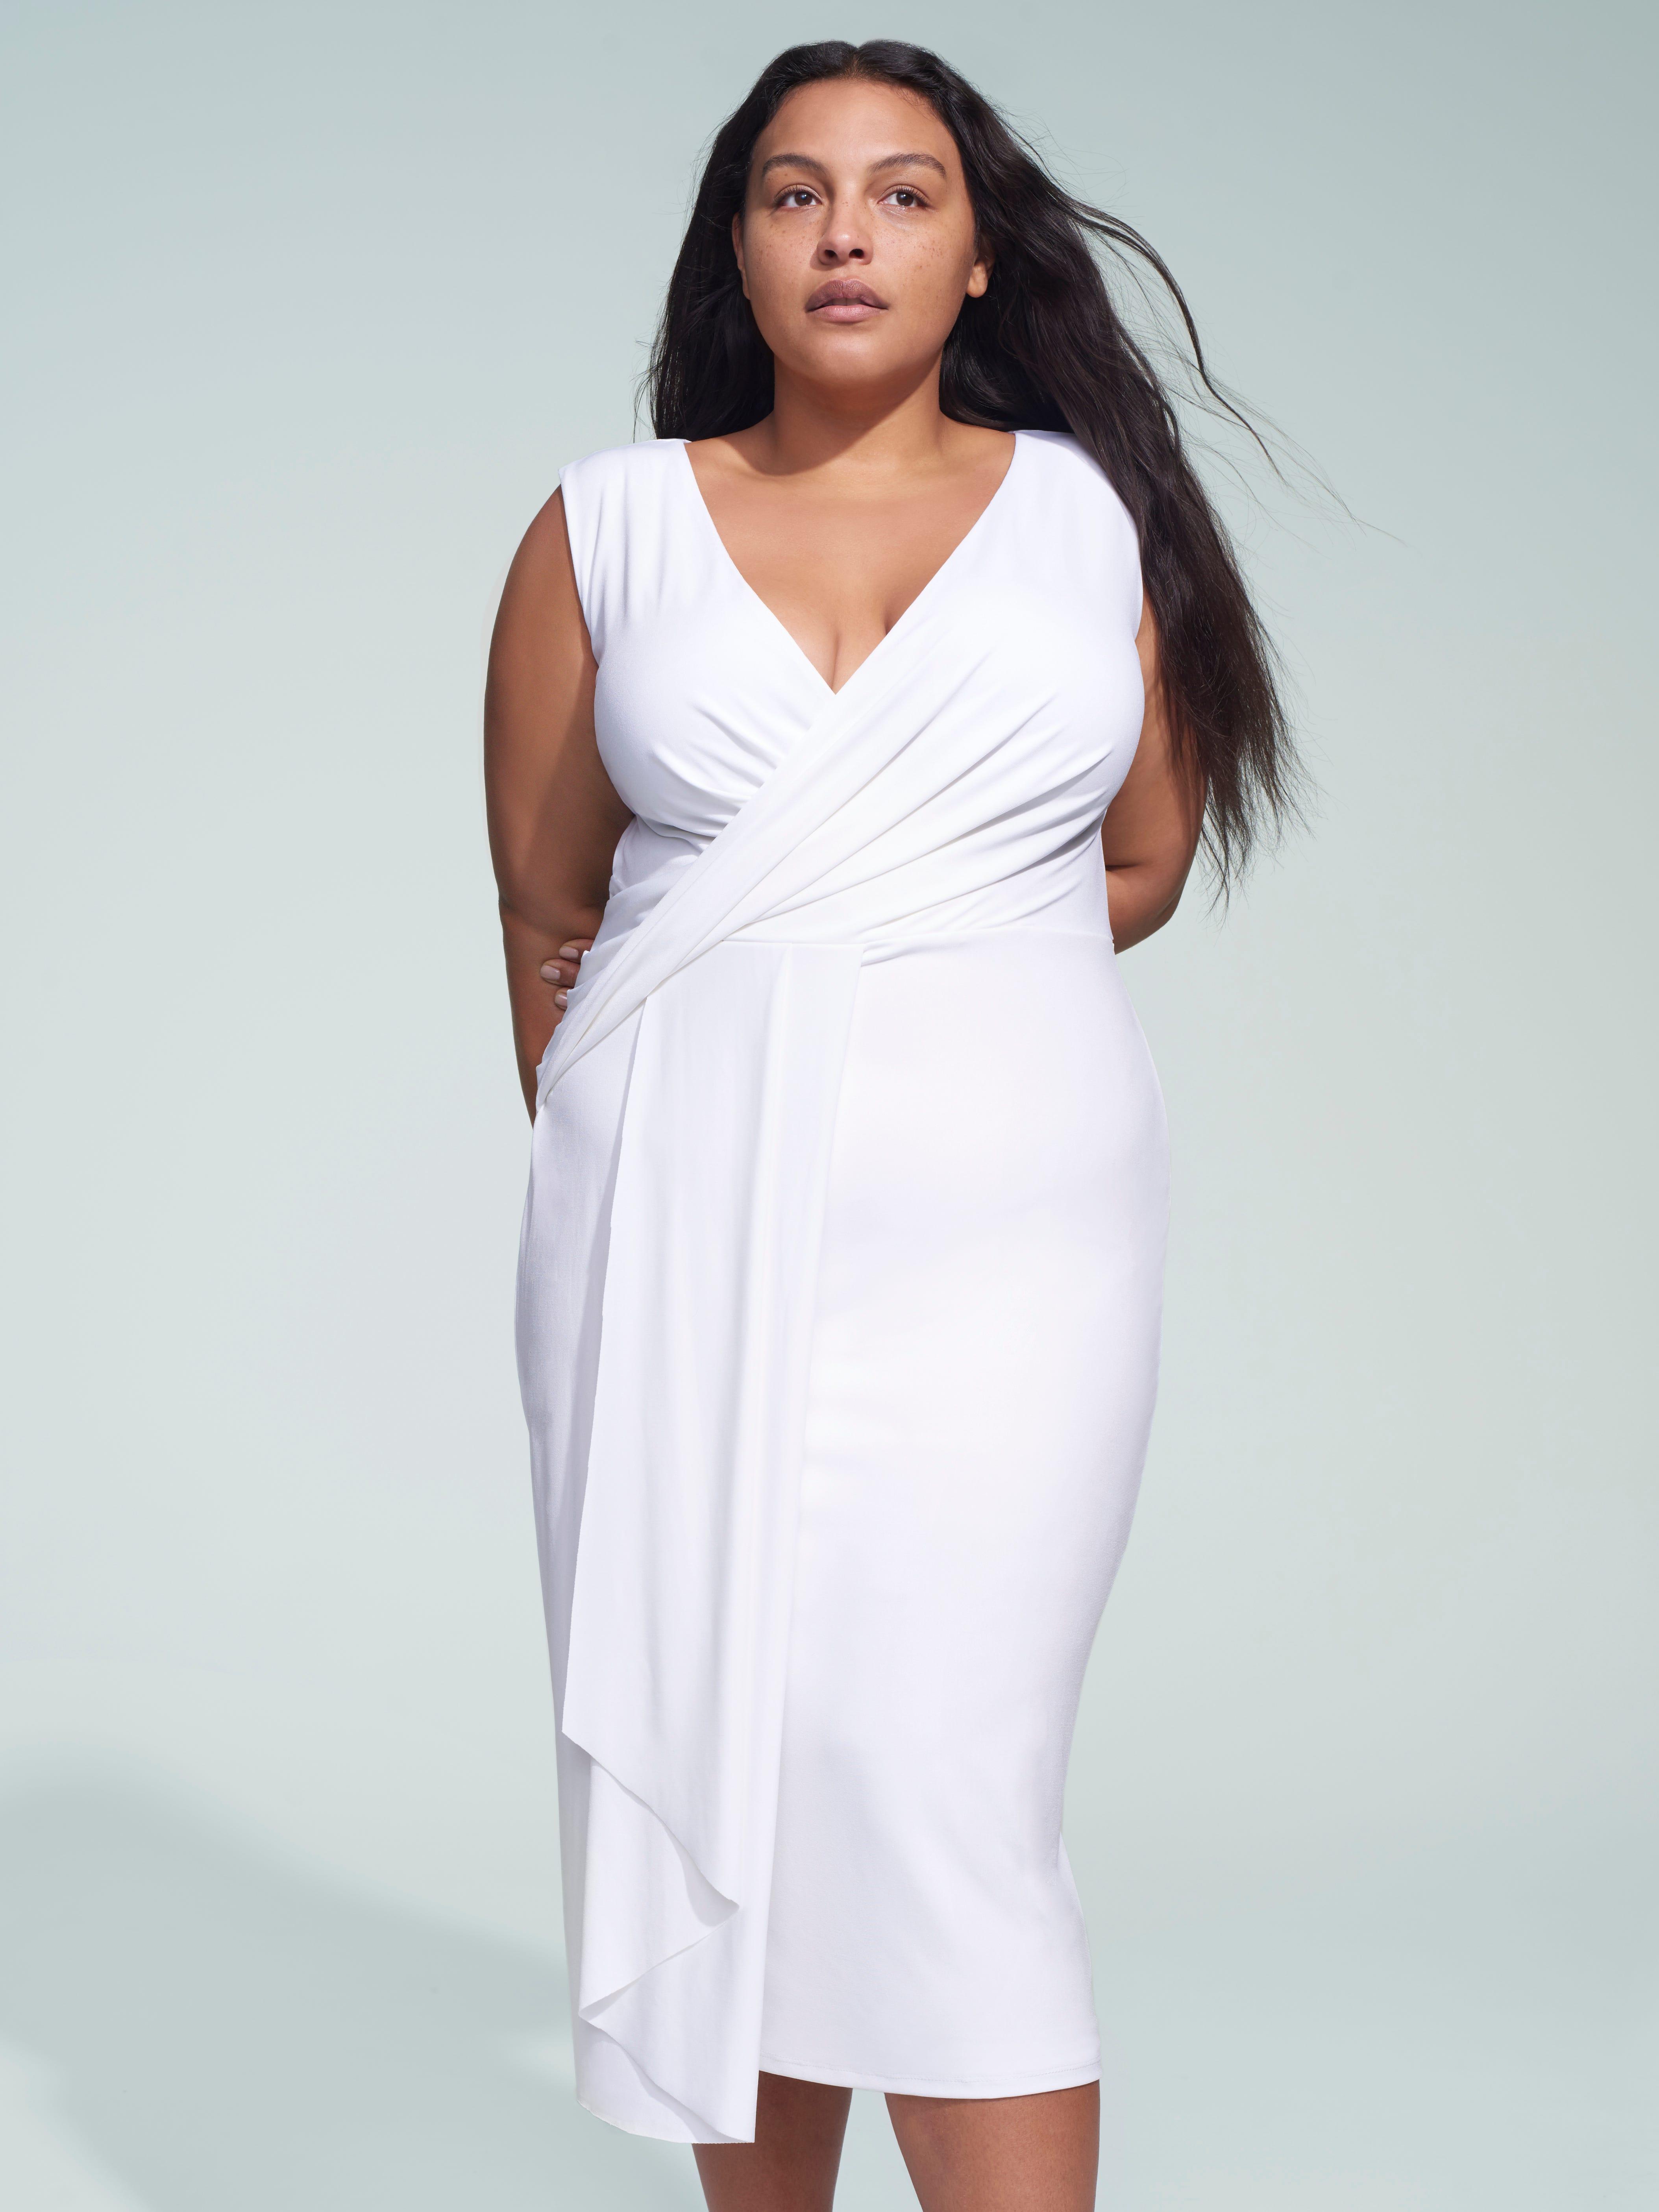 bd8003415d2 Eloquii x Jaxon Wu Plus Size Spring Clothing Line 2019